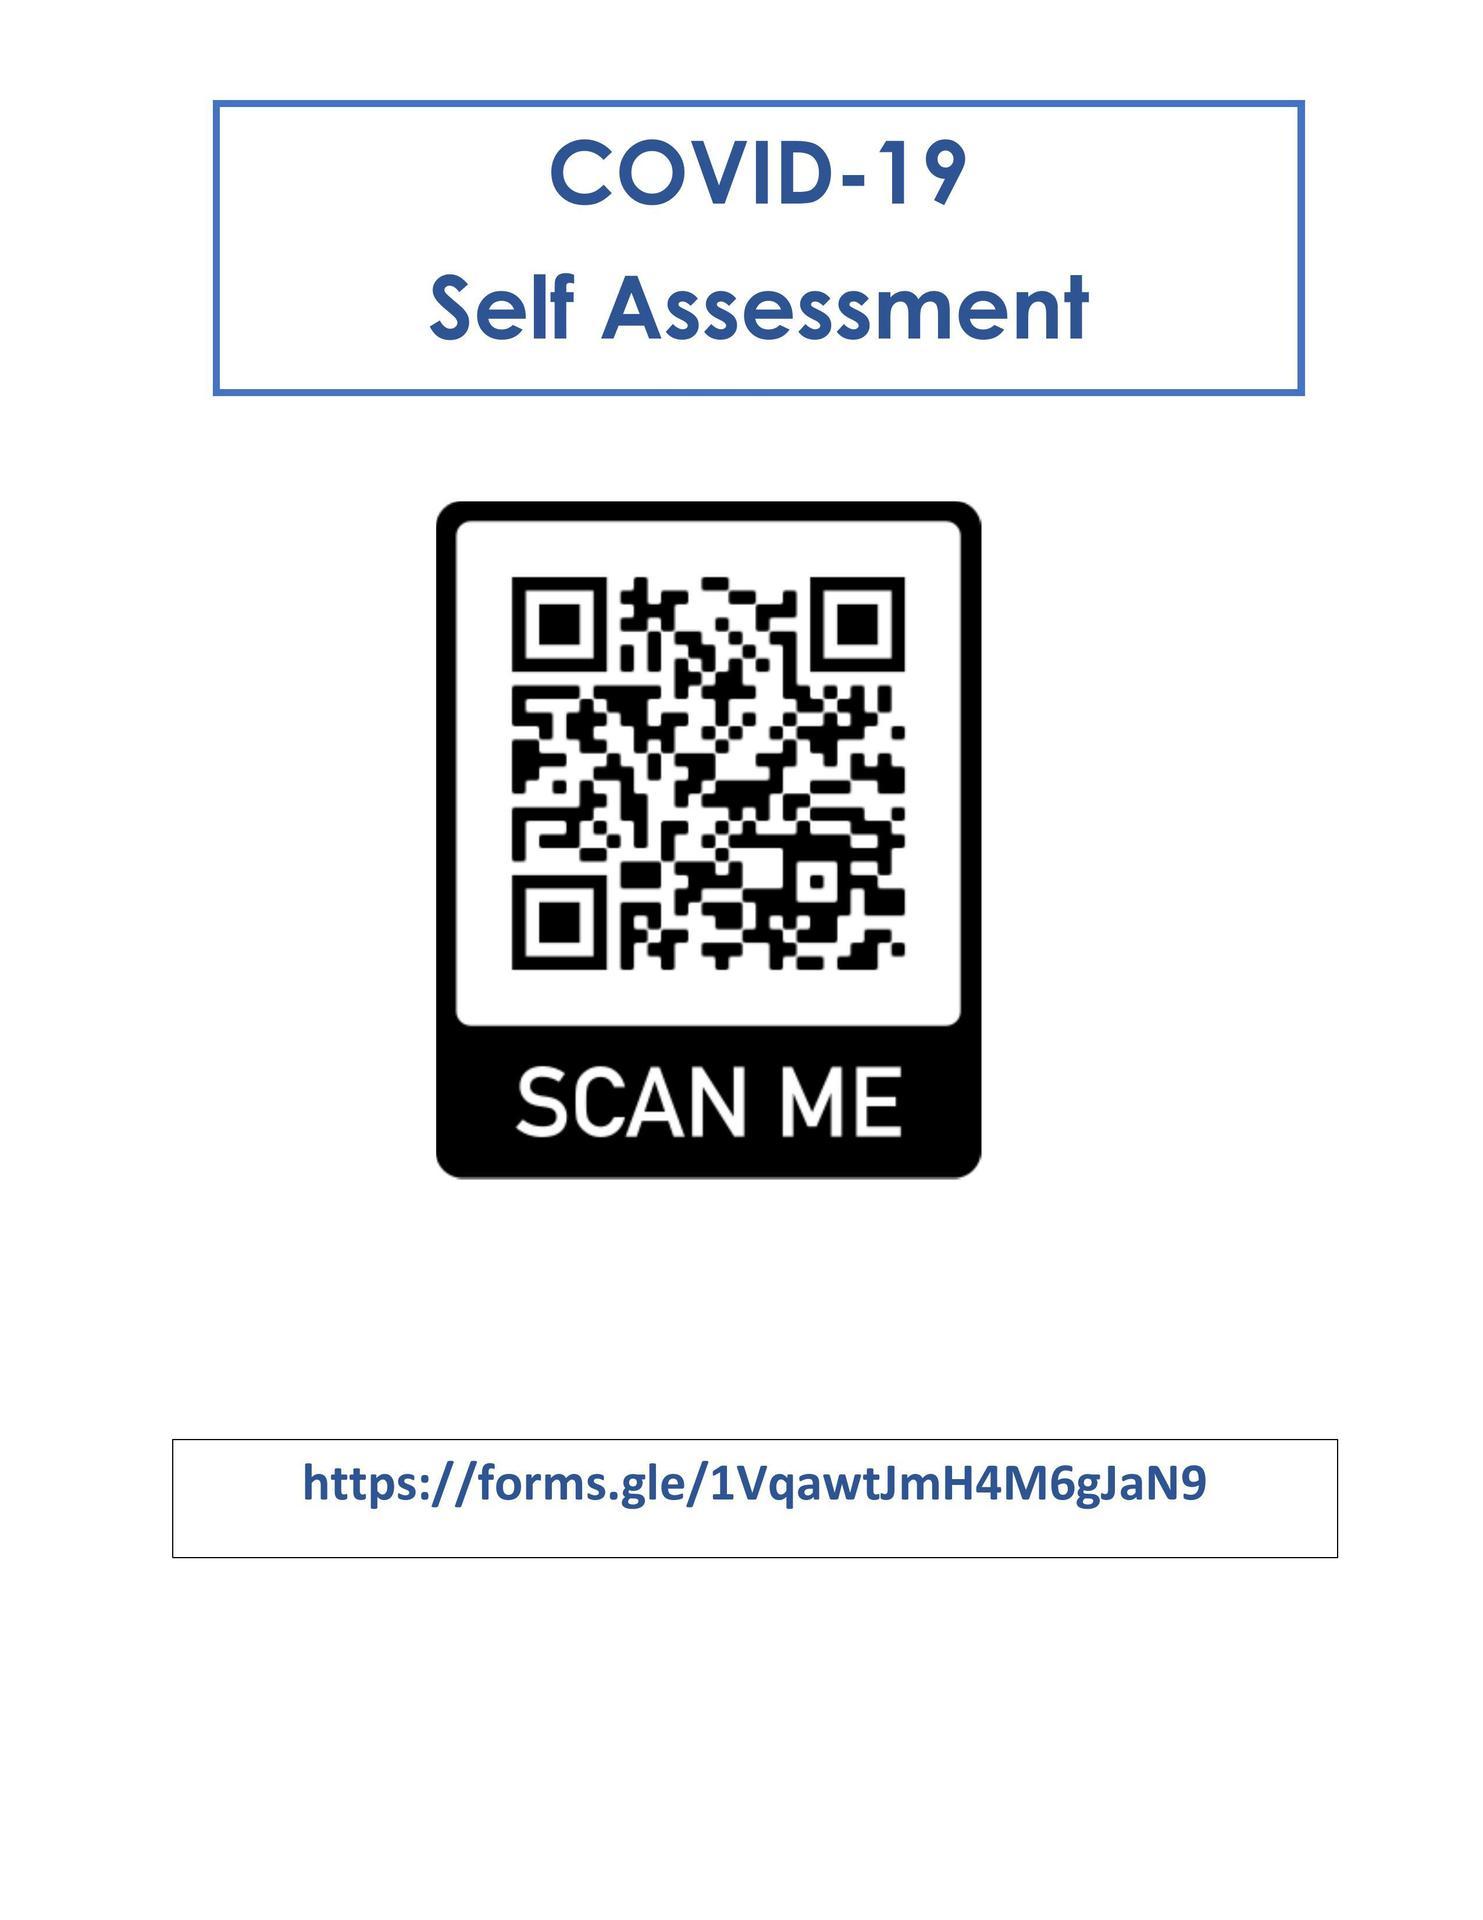 Covid-19 Self Assessment Form